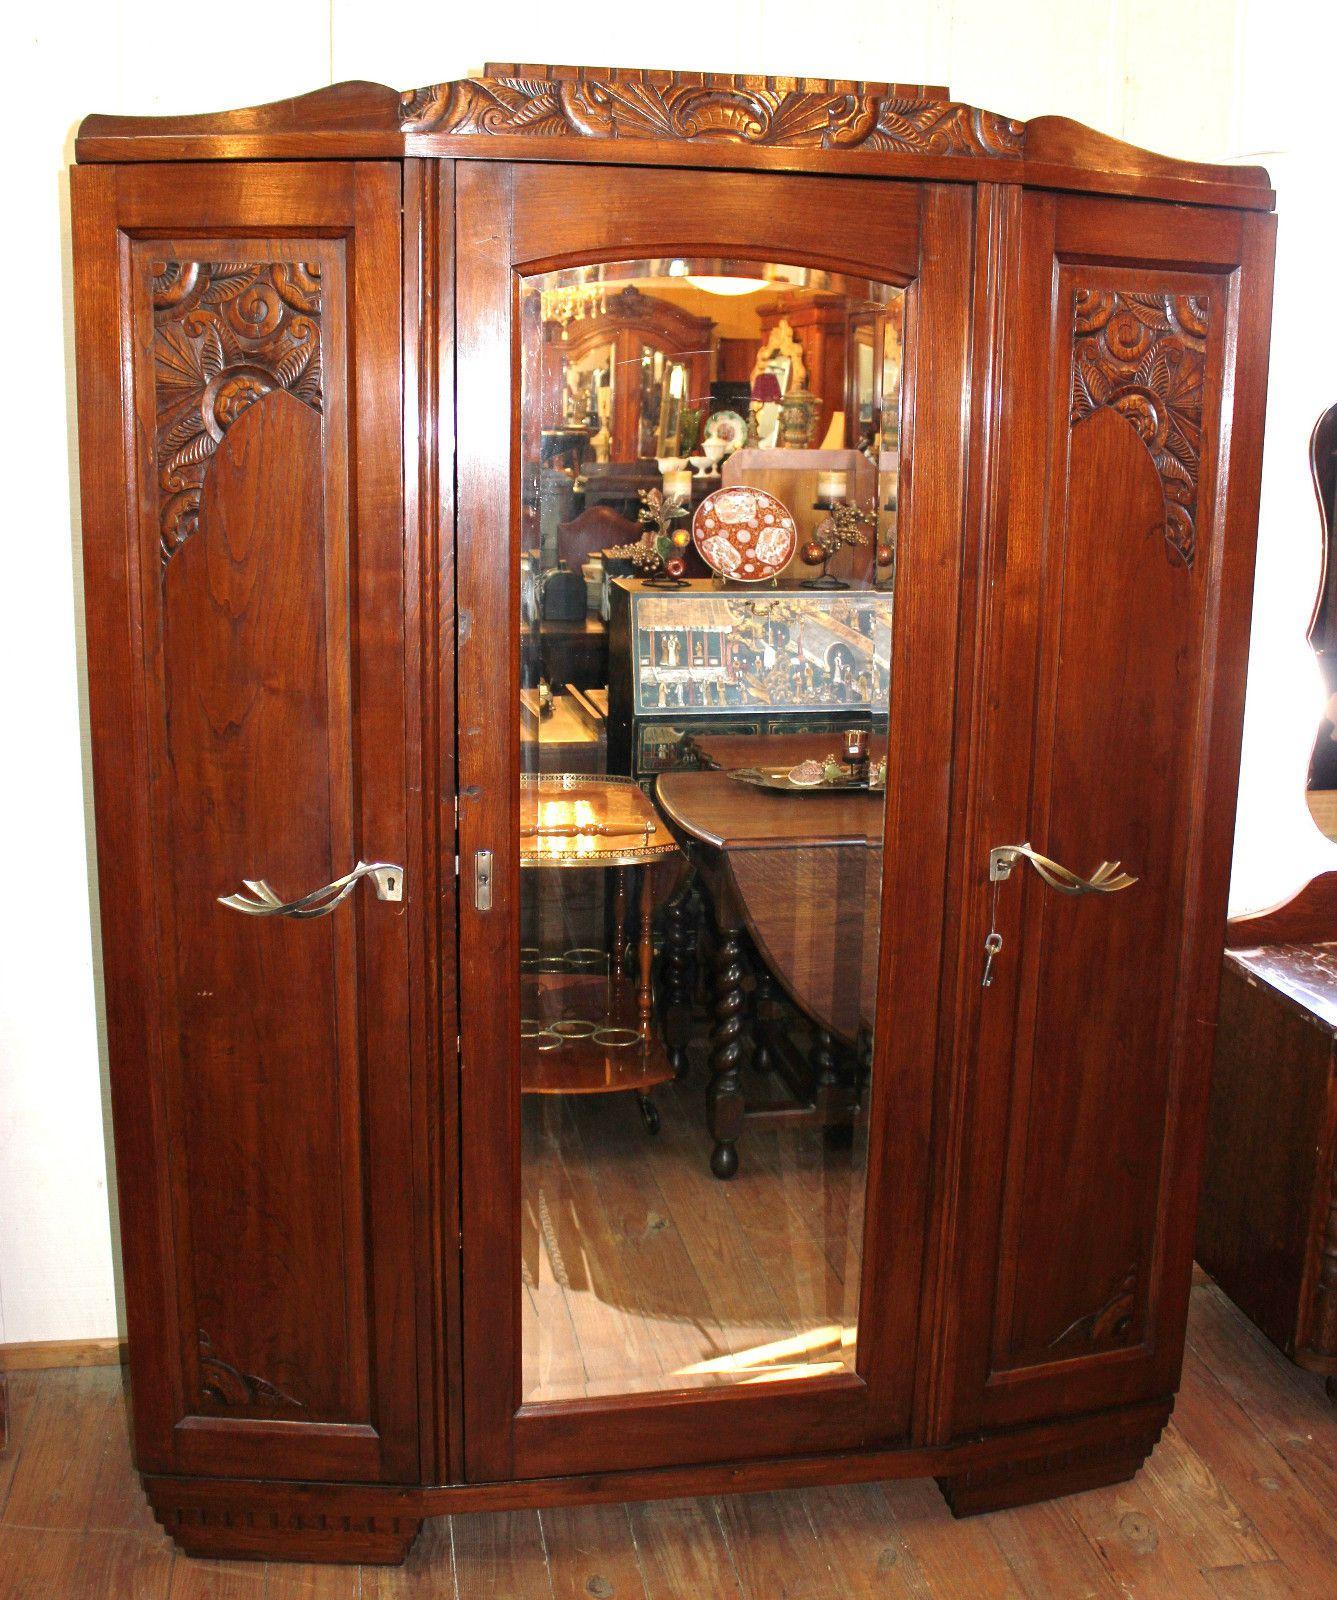 Lovely French Antique 3 Door Art Deco Wardrobe Armoire | EBay